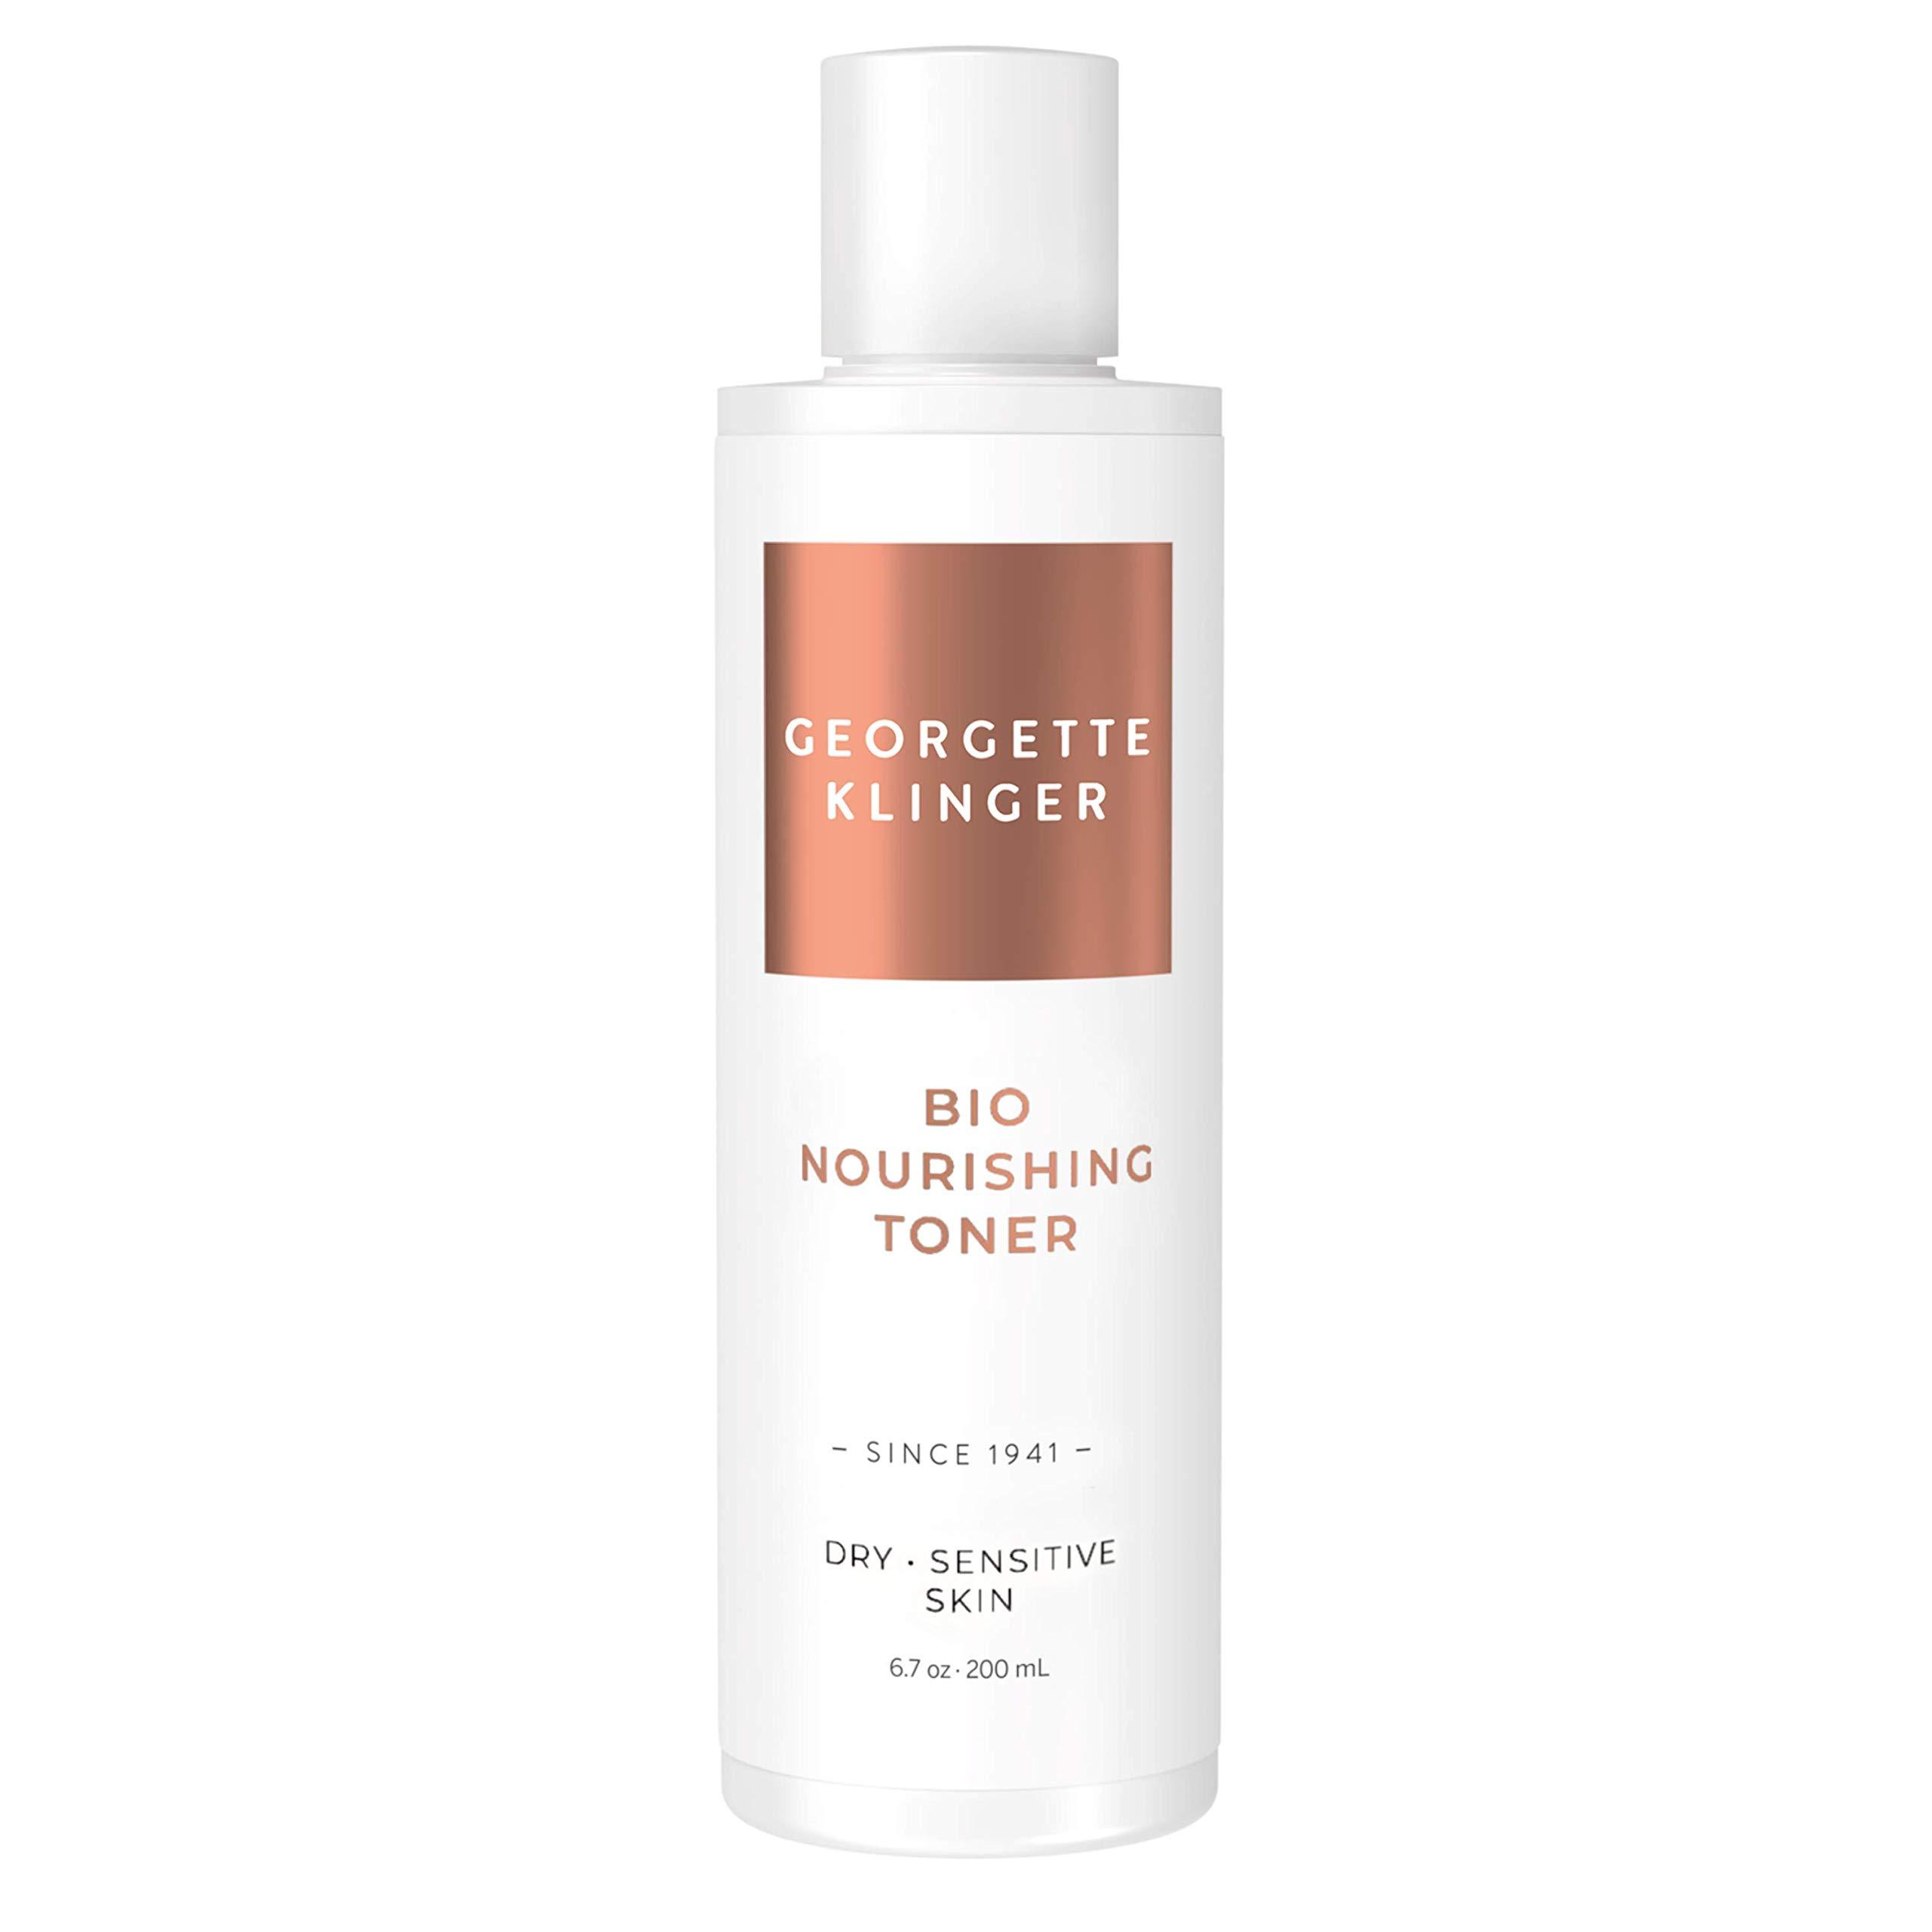 Georgette Klinger Bio Nourishing Face Toner – Vitamin & Botanical Rich to Clean, Soothe & Nourish Dry, Sensitive Skin